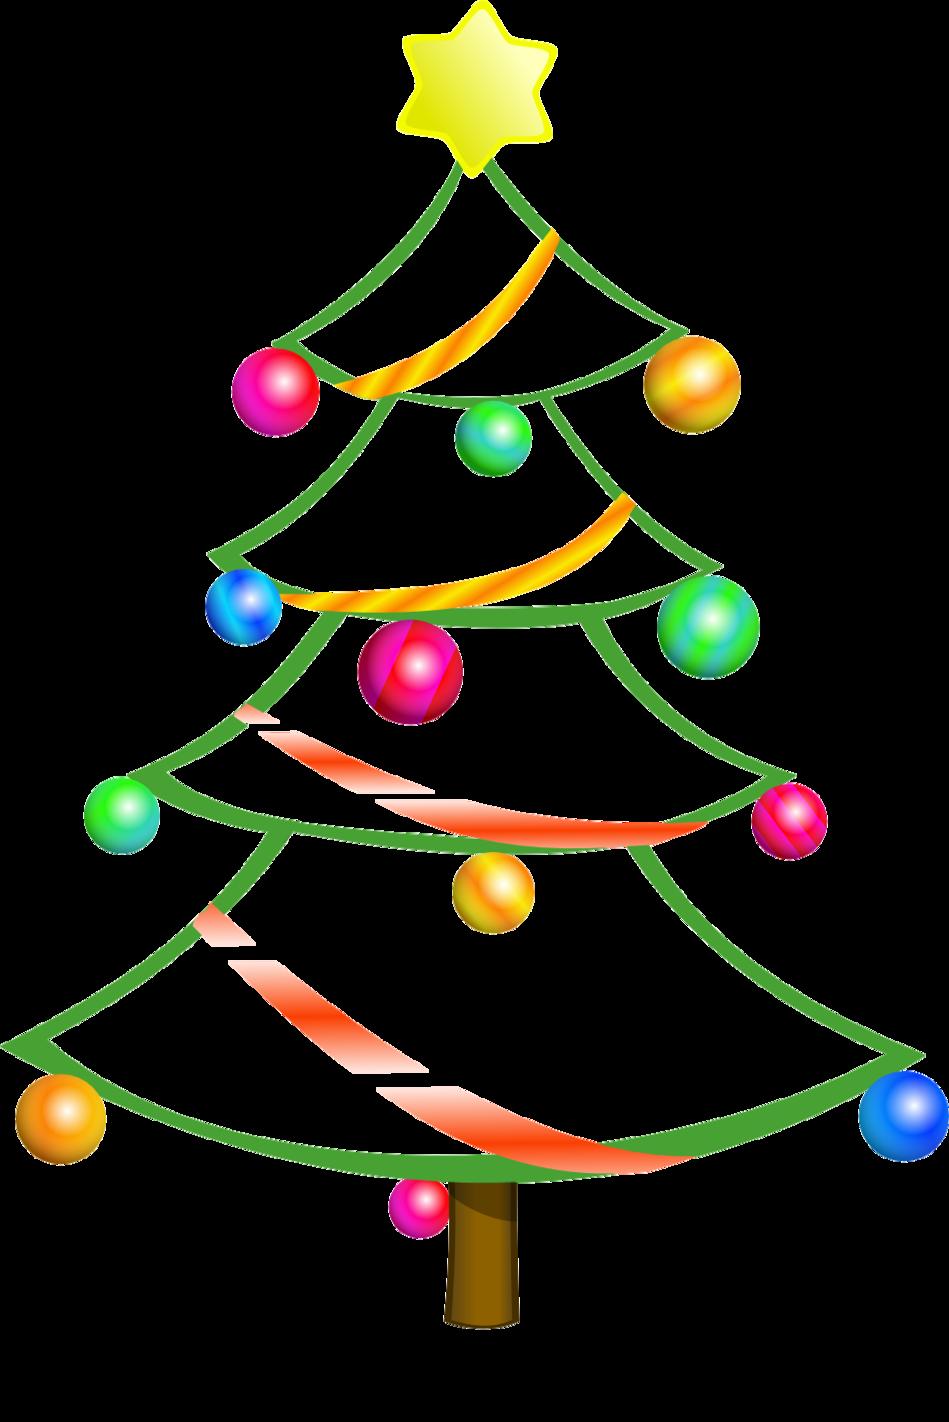 Clip Art. Christmas Tree Clip Art Free. Drupload.com Free Clipart.